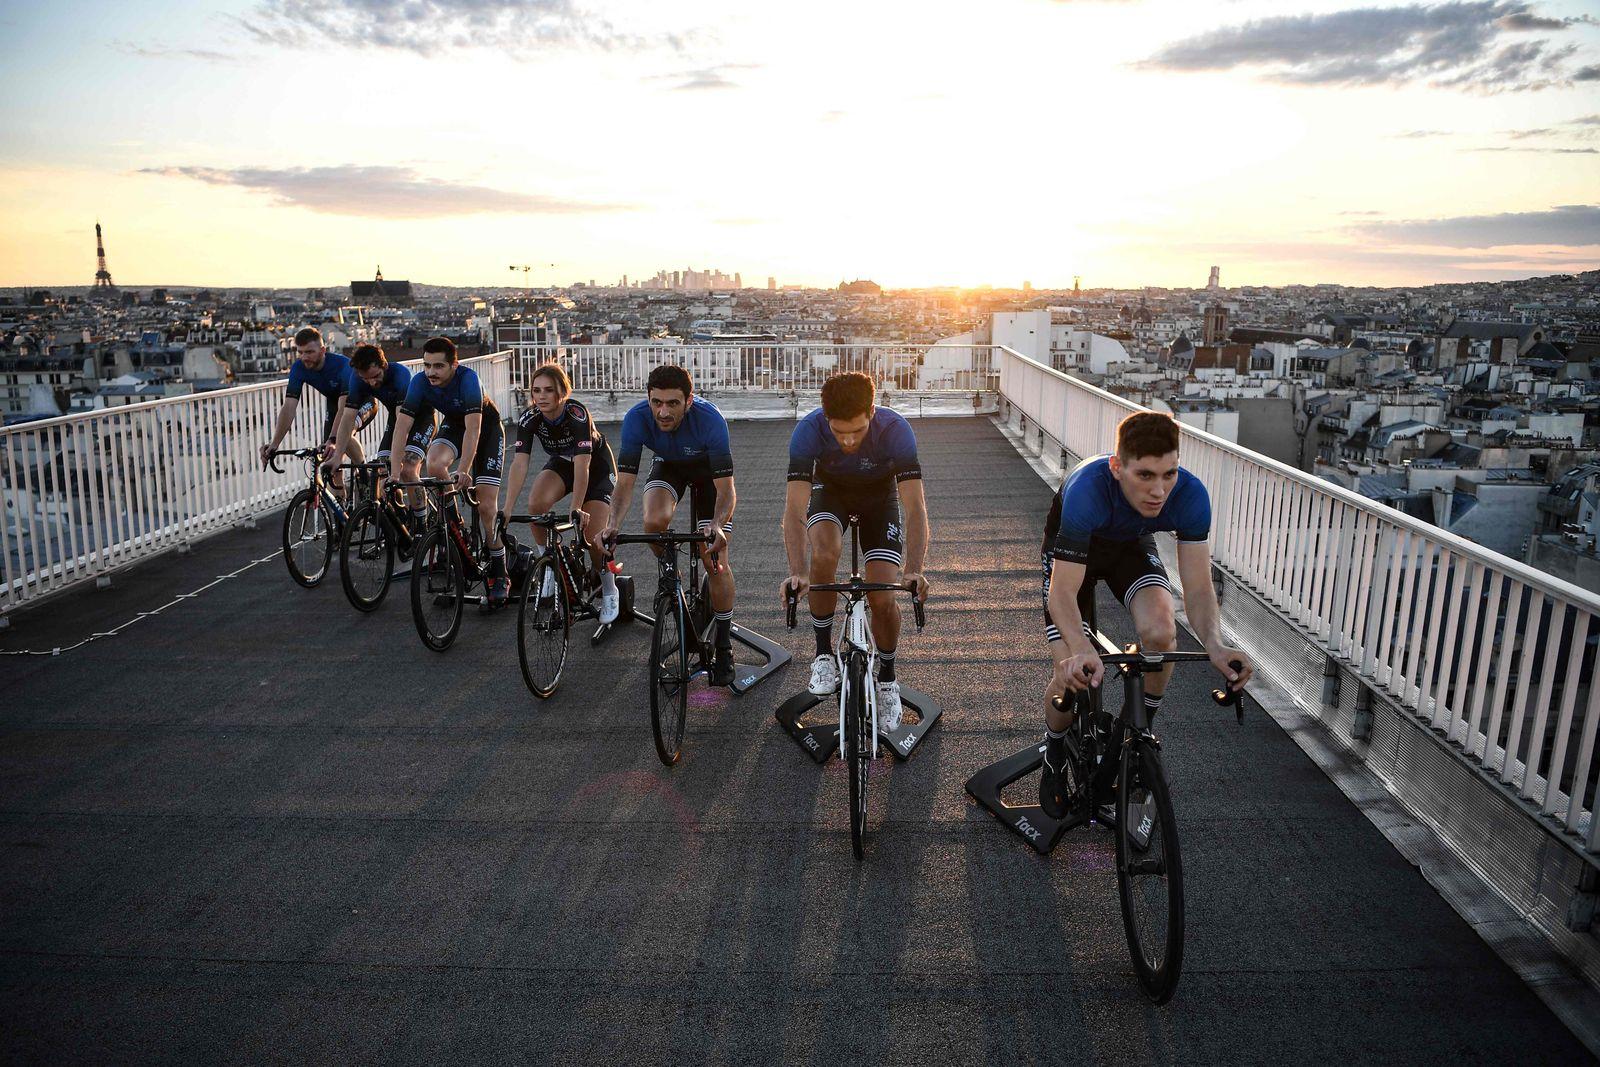 TOPSHOT-CYCLING-FRA-E-SPORT